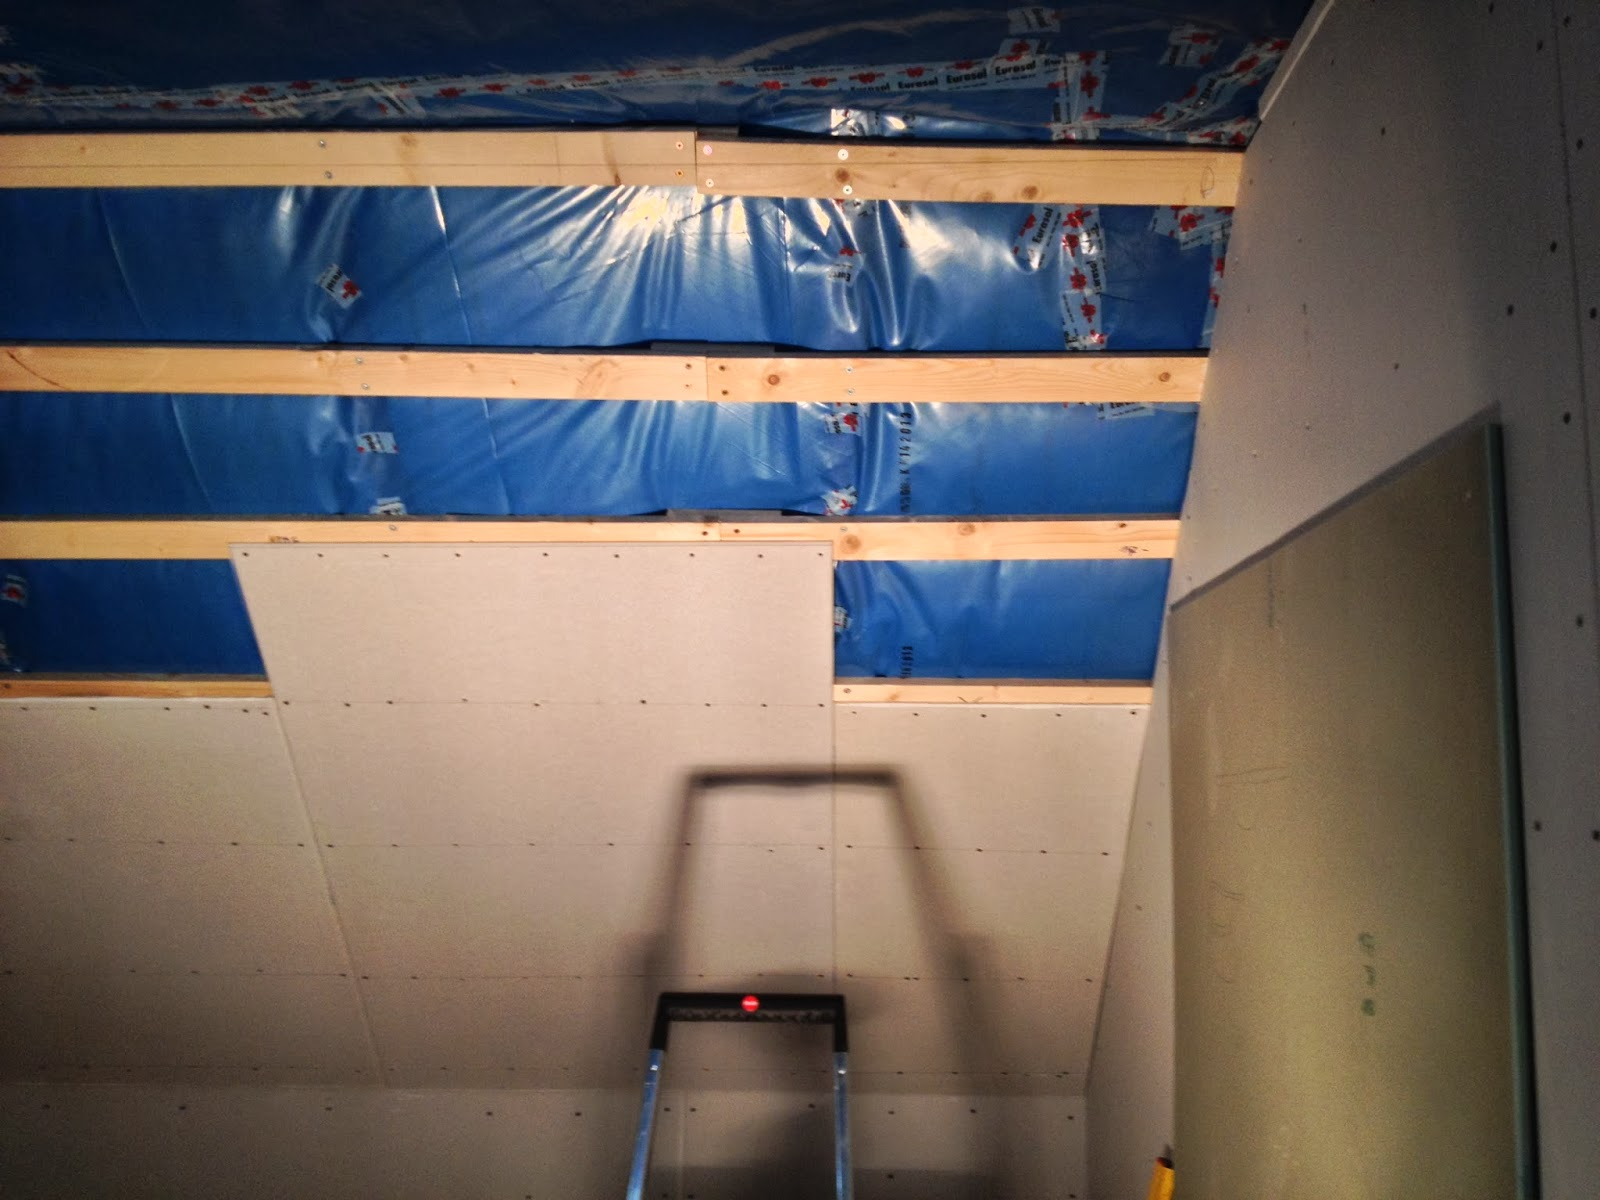 Sechseckwanne dachschräge  Bautagebuch Hassenroth: Januar 2014